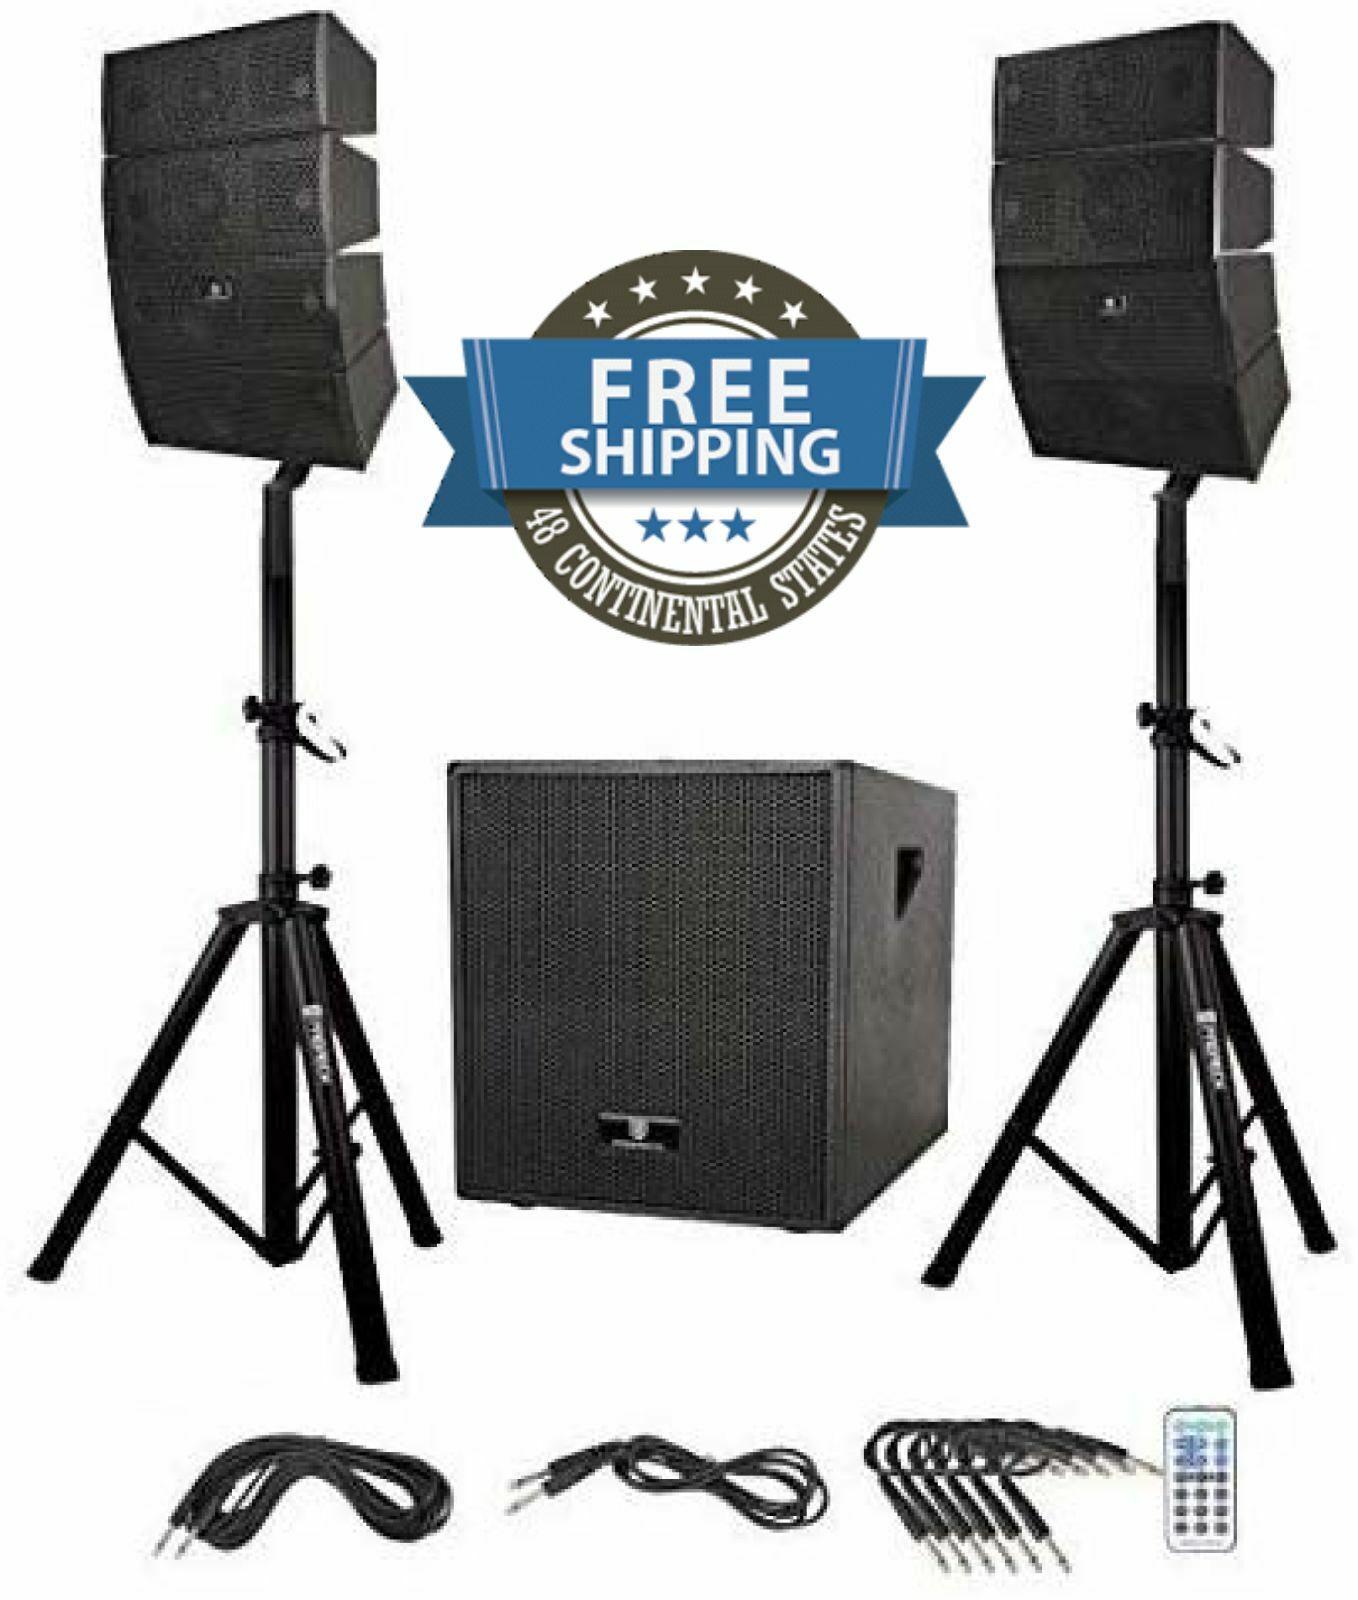 Lautsprecher steht Pair System Blautooth Outdoor Dance Party Mikrofon 12 In Set